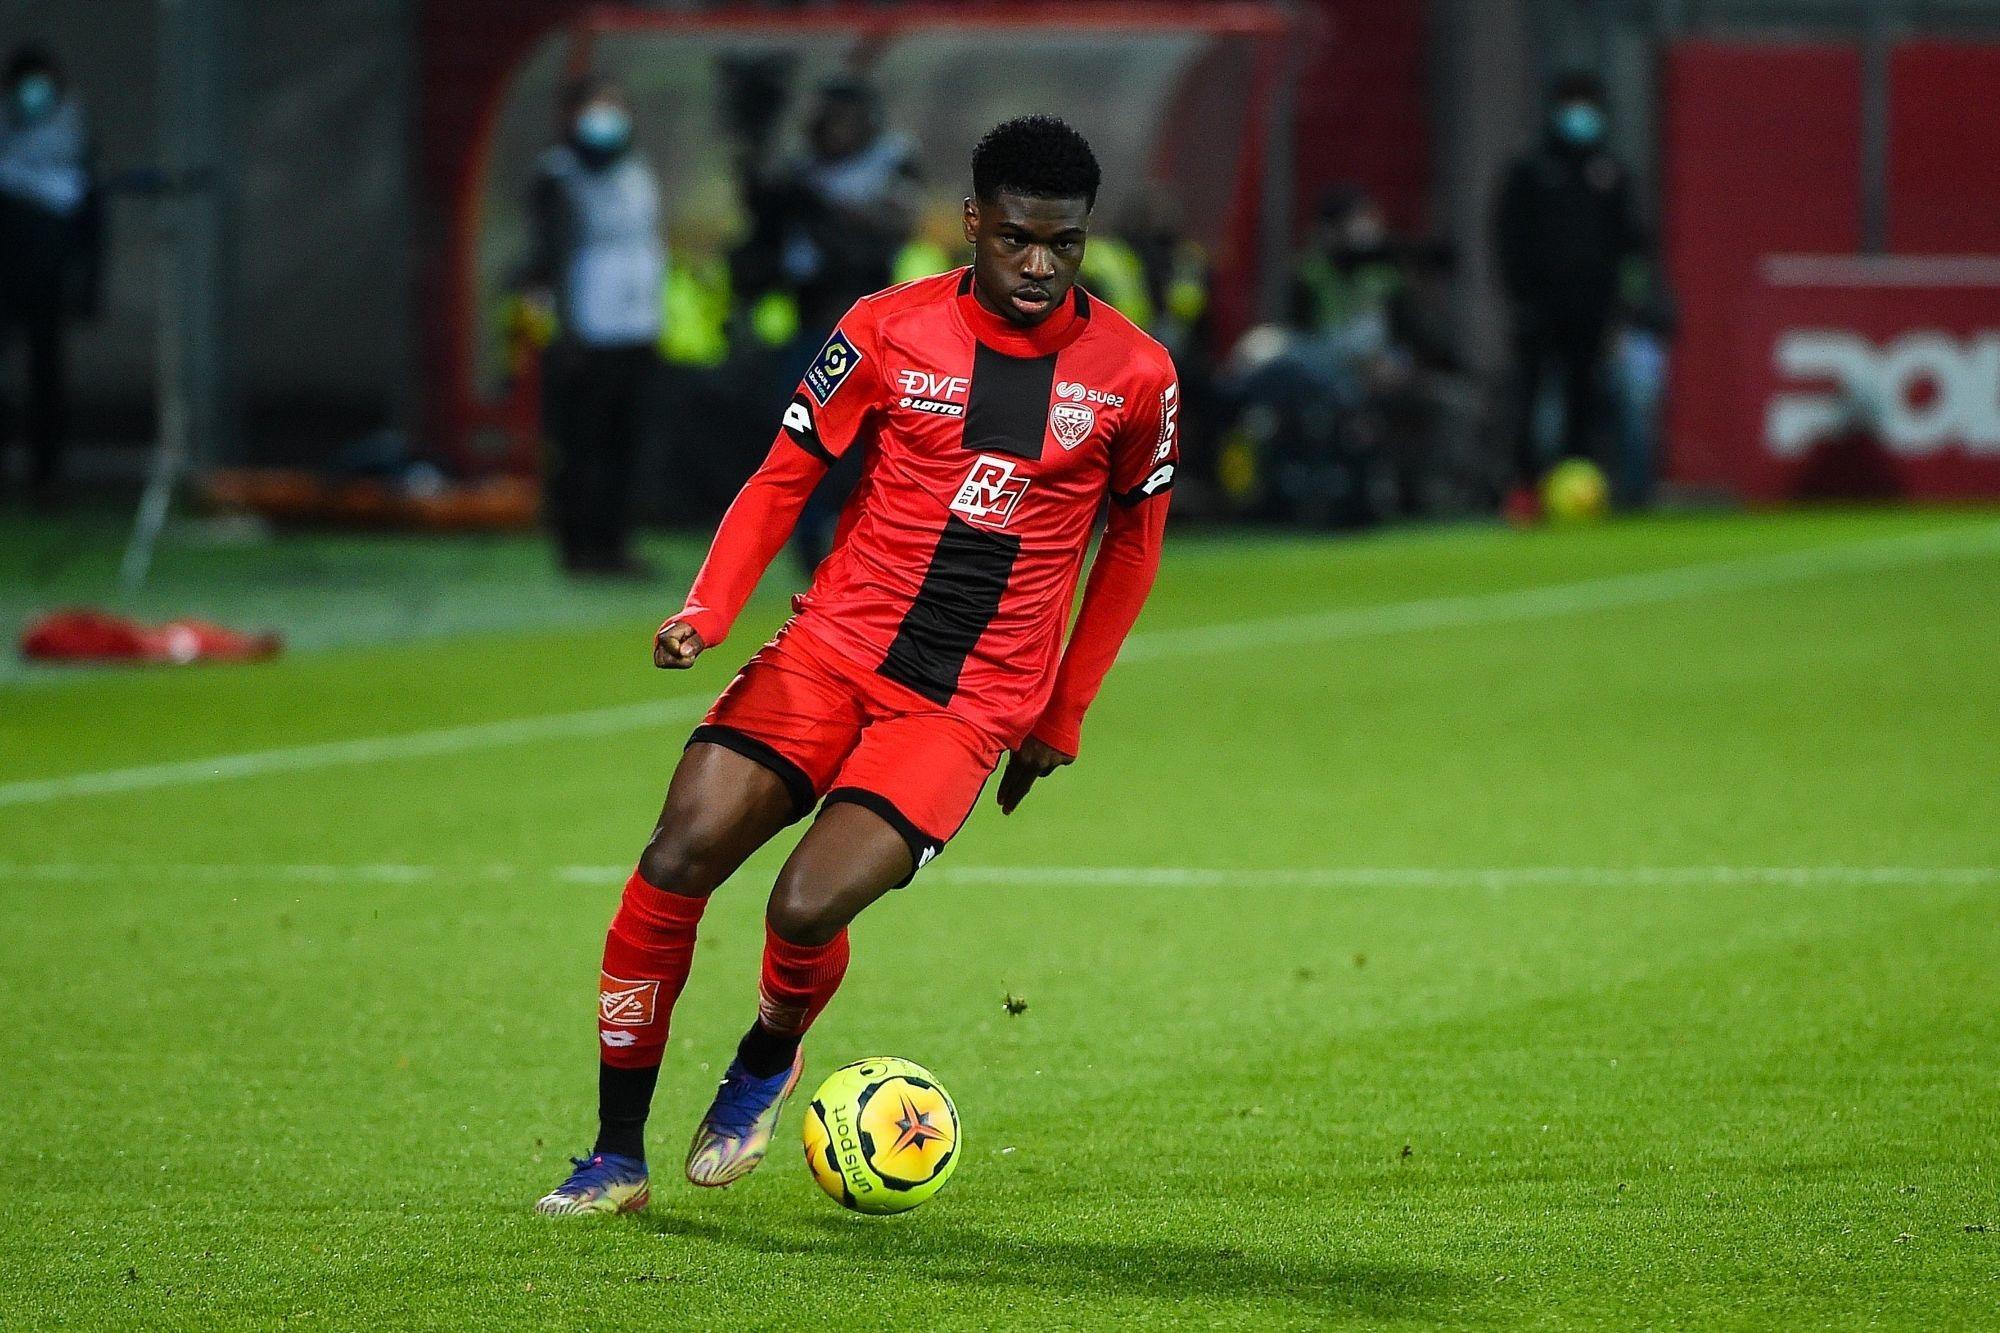 Mercato - Le Titi Dina-Ebimbe intéresse en Ligue 1 et Bundesliga, selon Foot Mercato